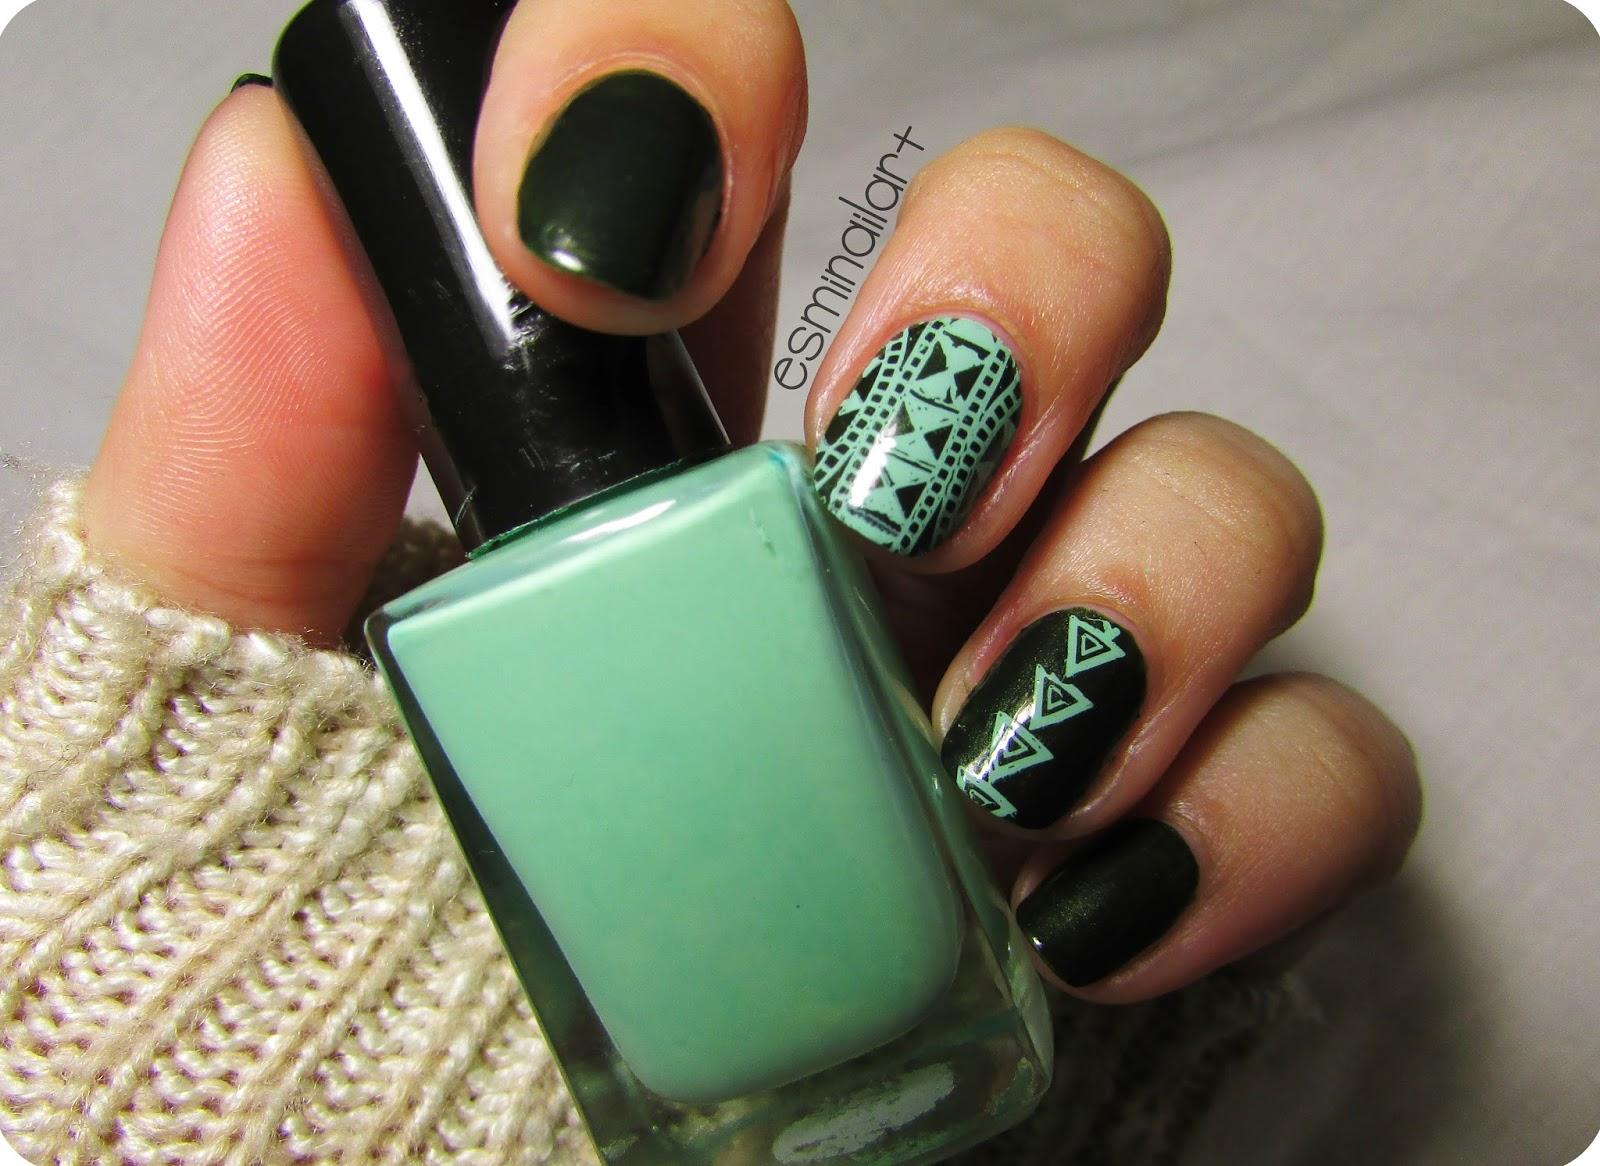 Mi nail art!: Nail art geométrico | Mundo de uñas